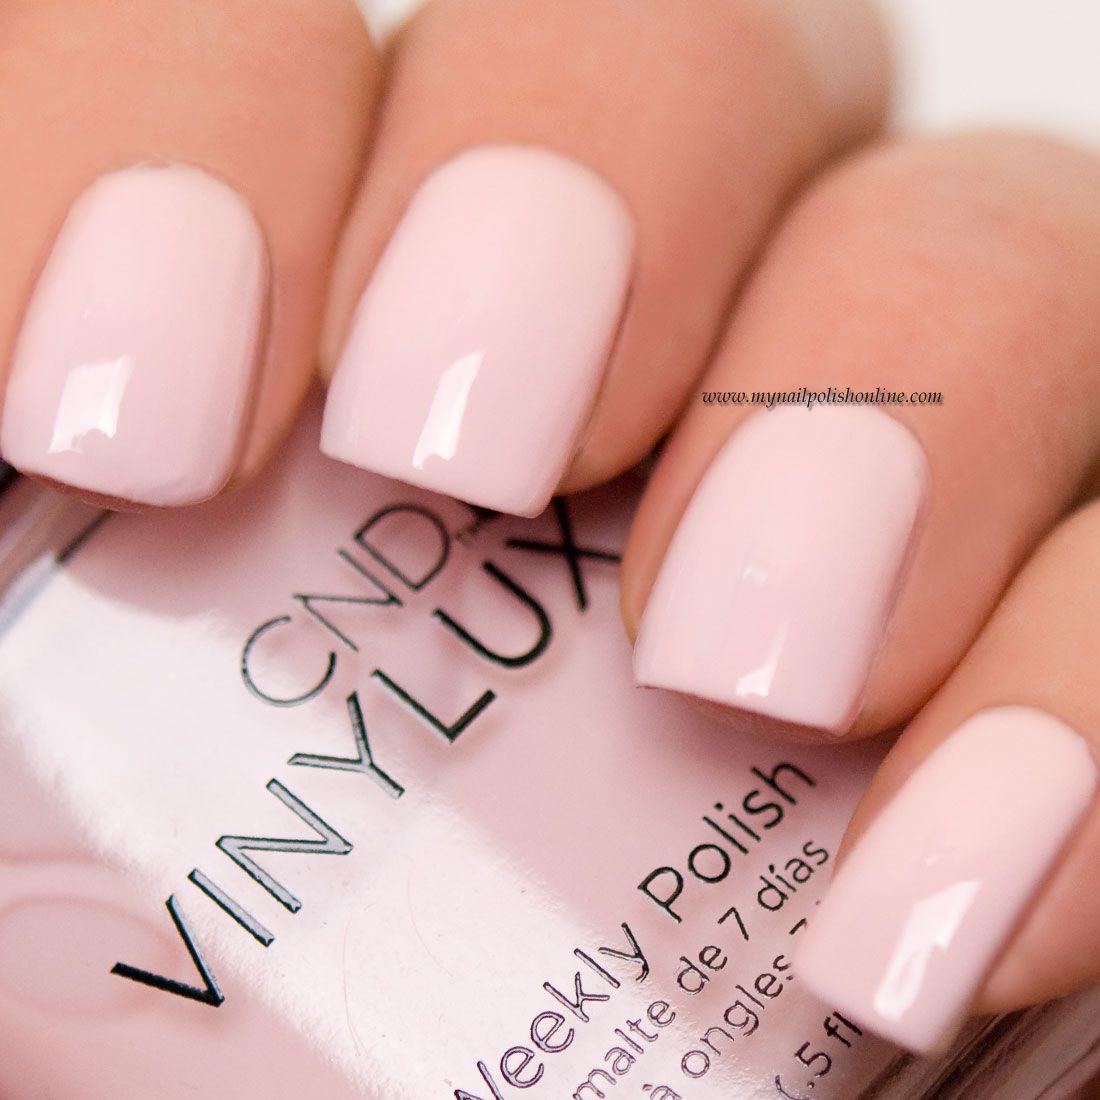 CND Vinylux - Winter Glow   Cnd vinylux, Winter and Makeup